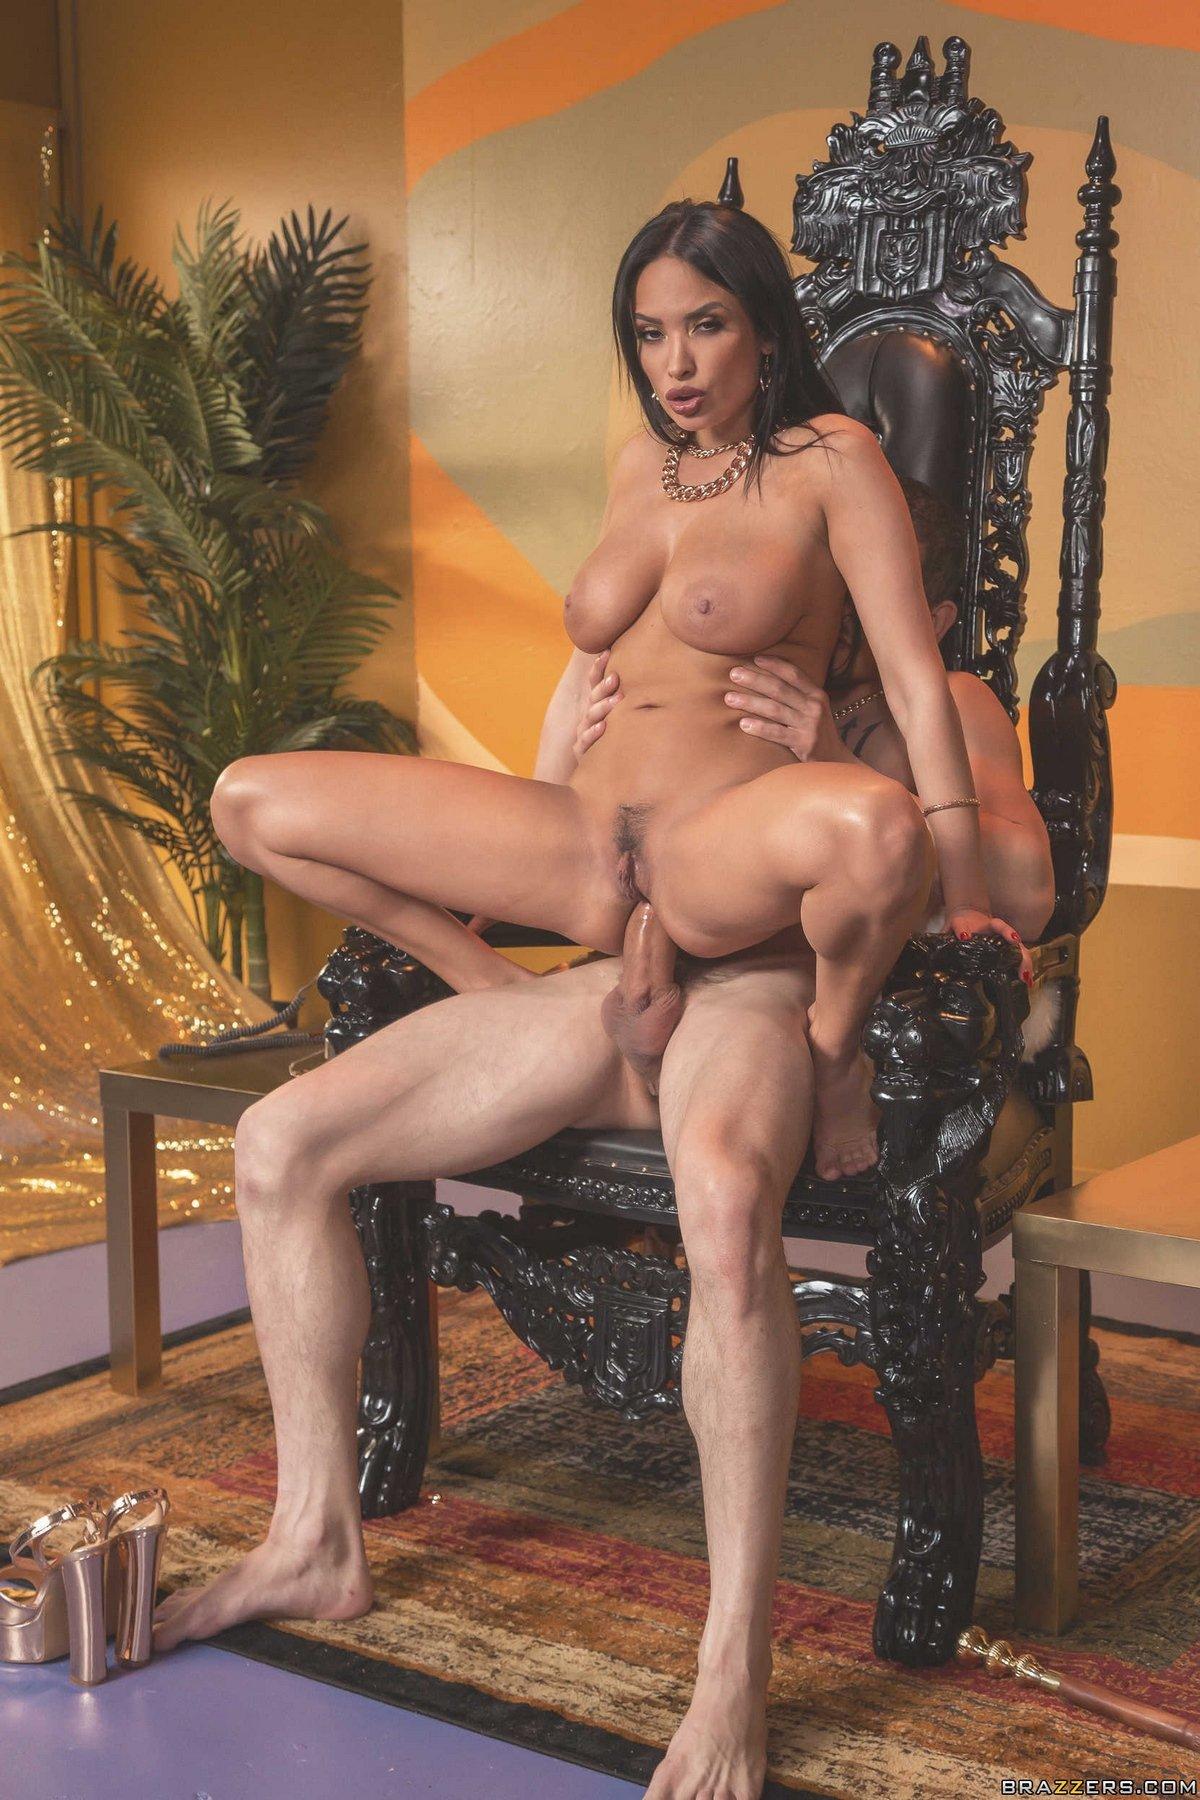 поняла тогда, ххх секс госпожа на троне неожиданности, она даже